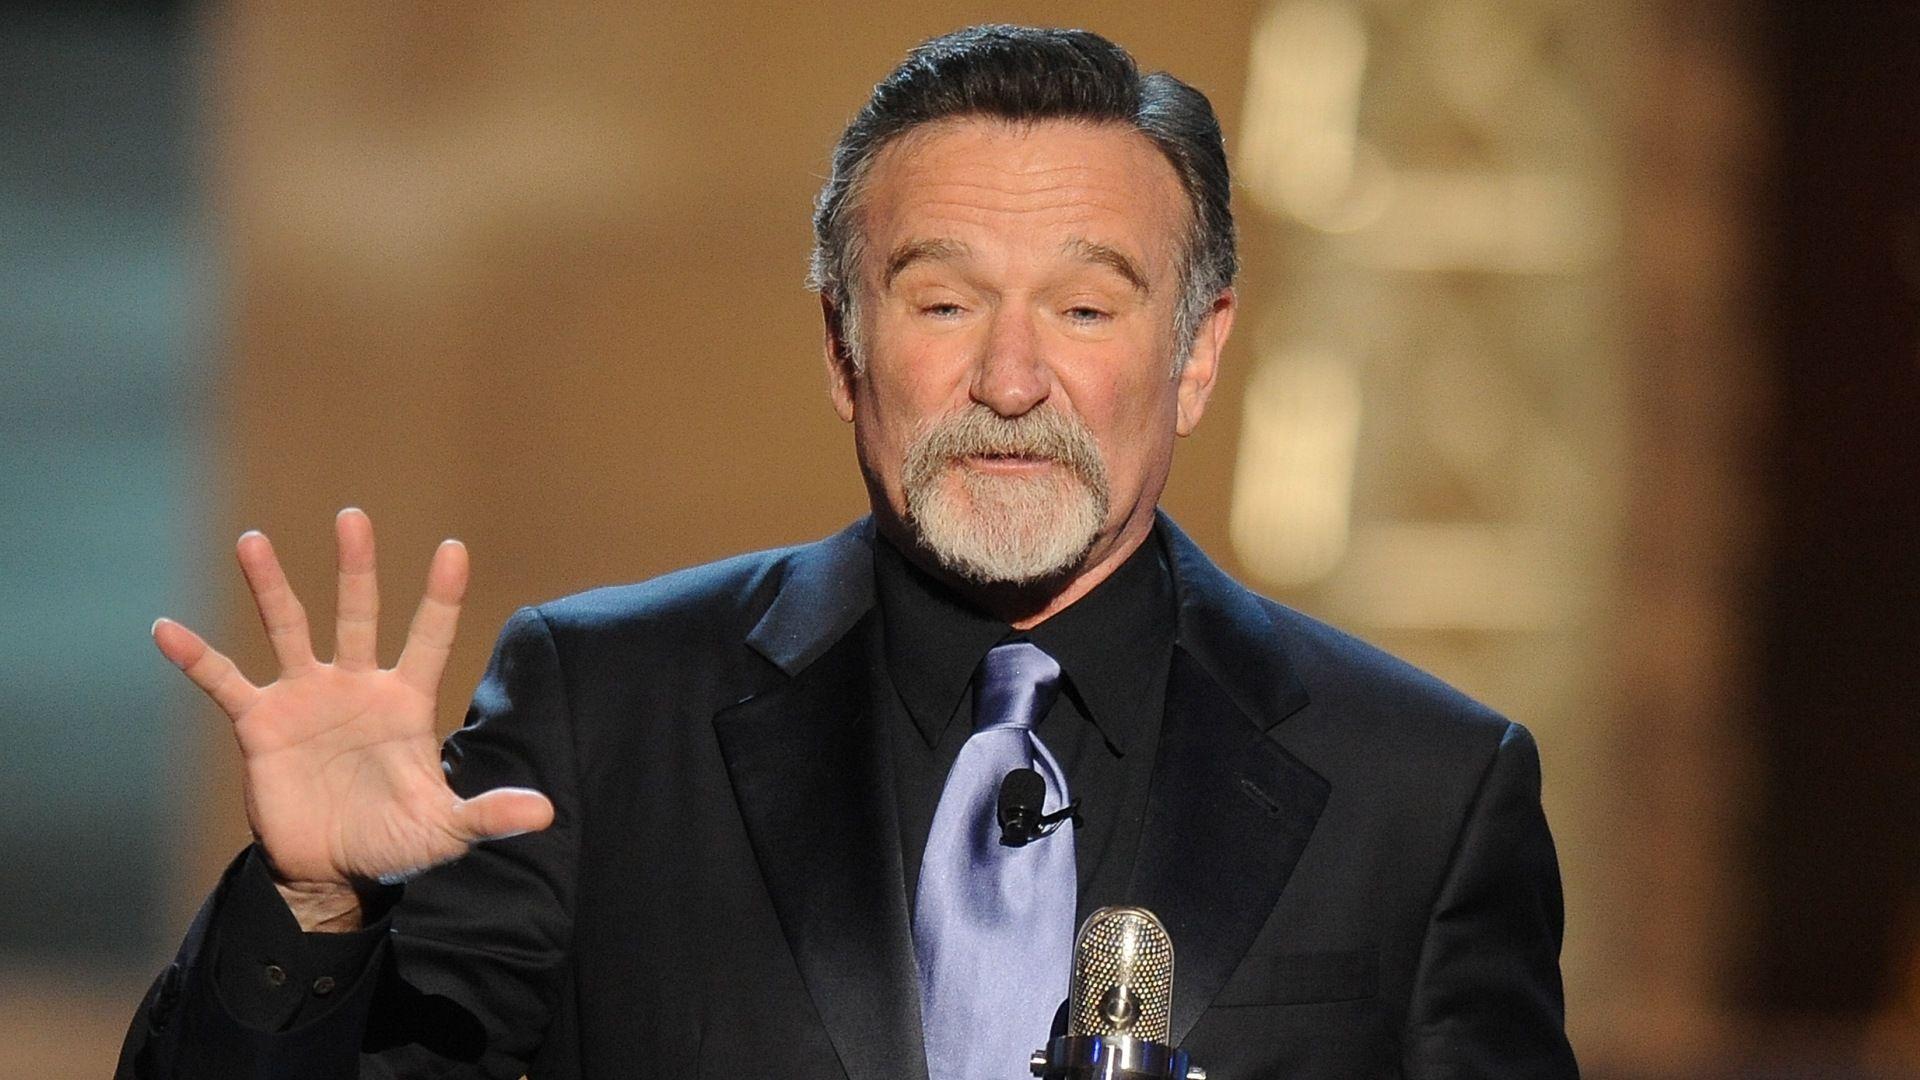 Barack Obama lamentó la muerte de Robin Williams: fue un actor único